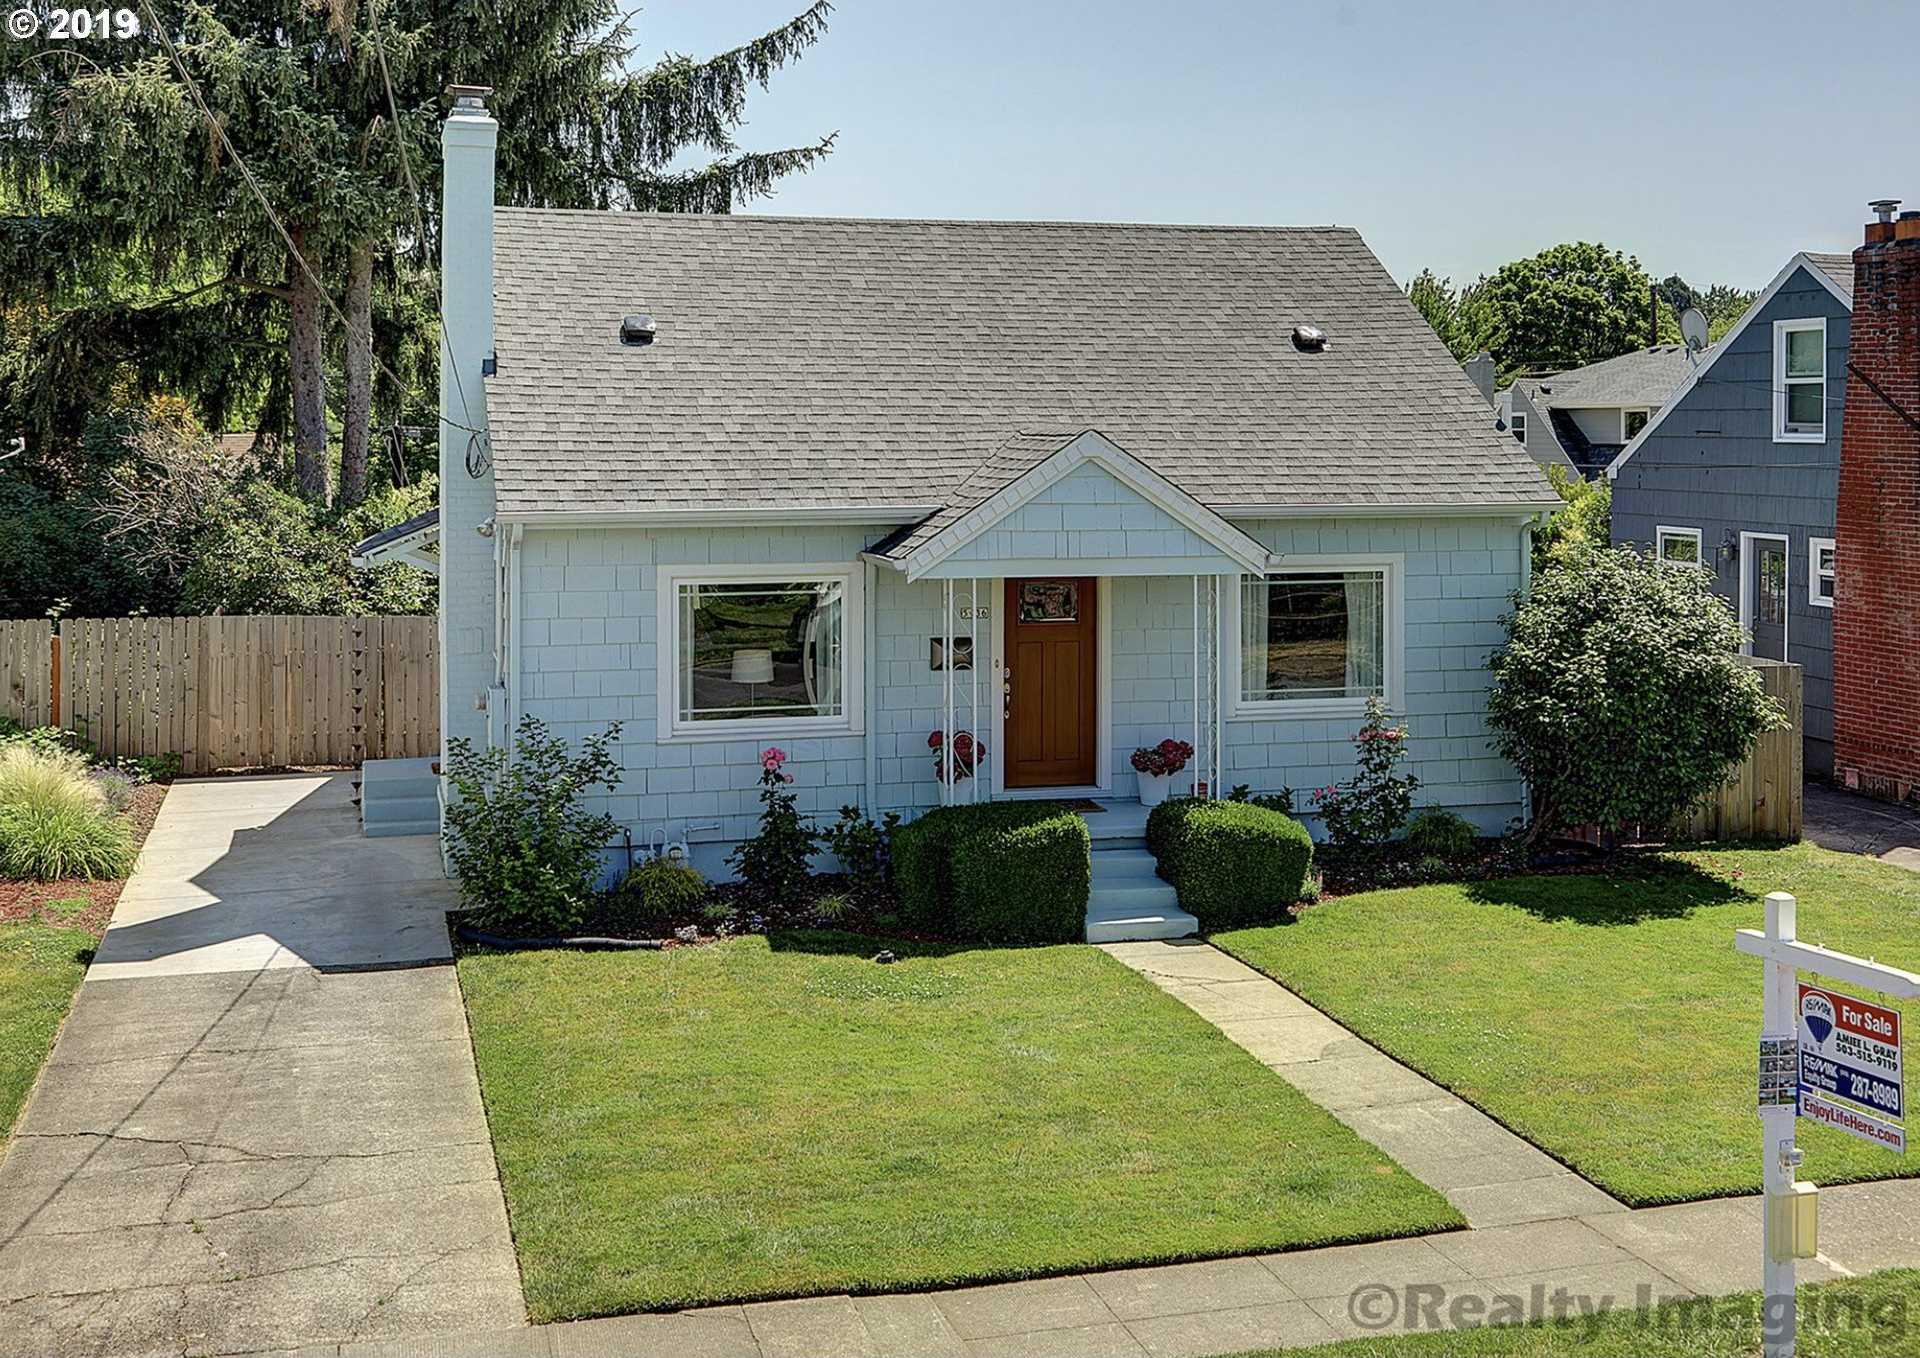 $529,900 - 3Br/1Ba -  for Sale in Westmoreland- Sellwood, Portland